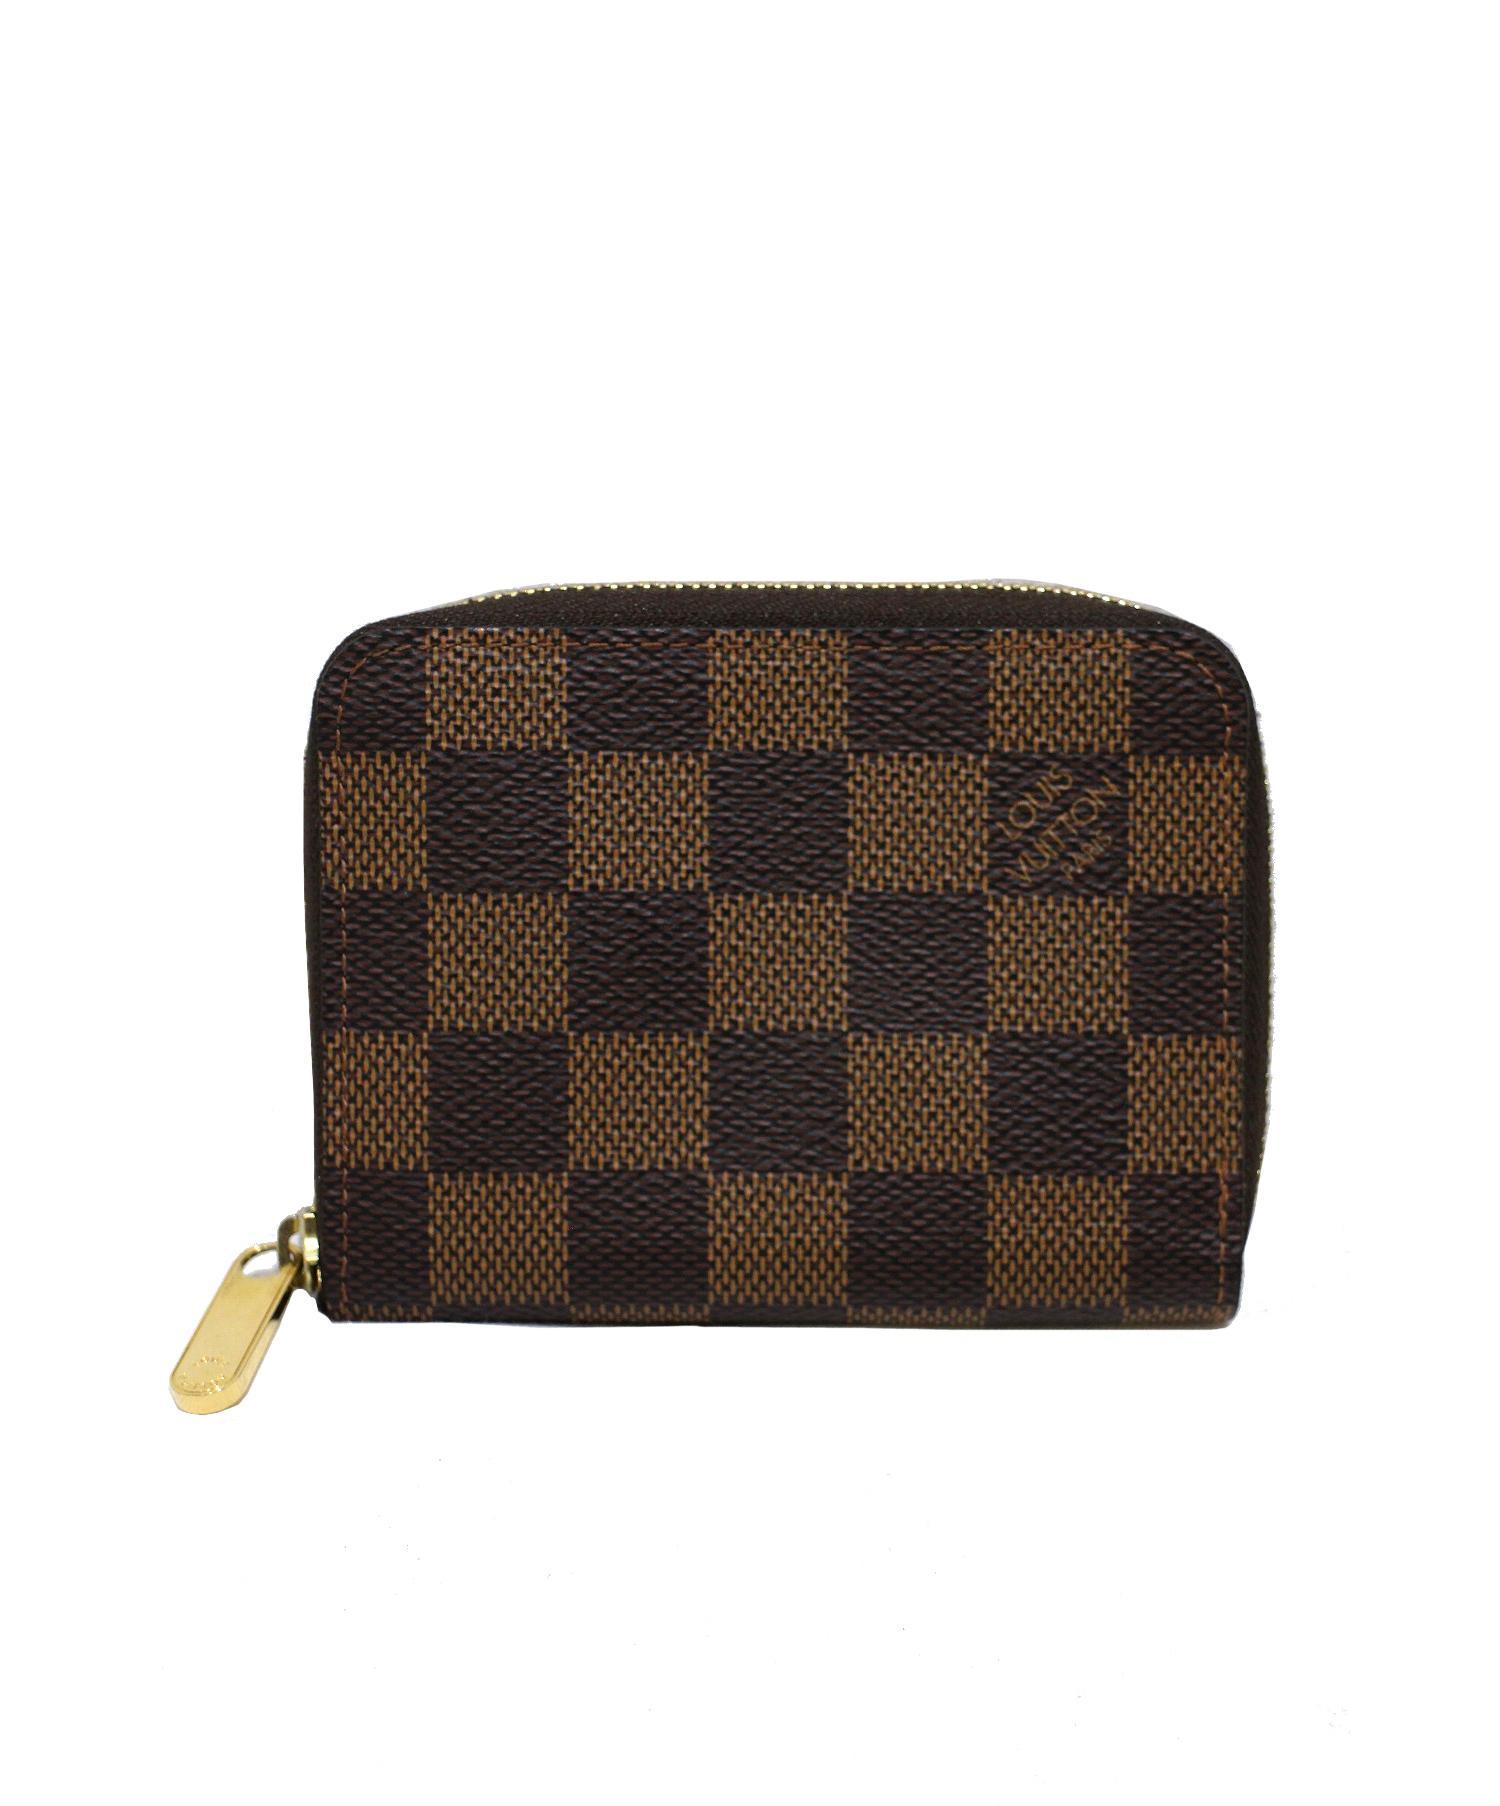 brand new d266a 82ea1 [中古]LOUIS VUITTON(ルイ・ヴィトン)のレディース 服飾小物 コインケース